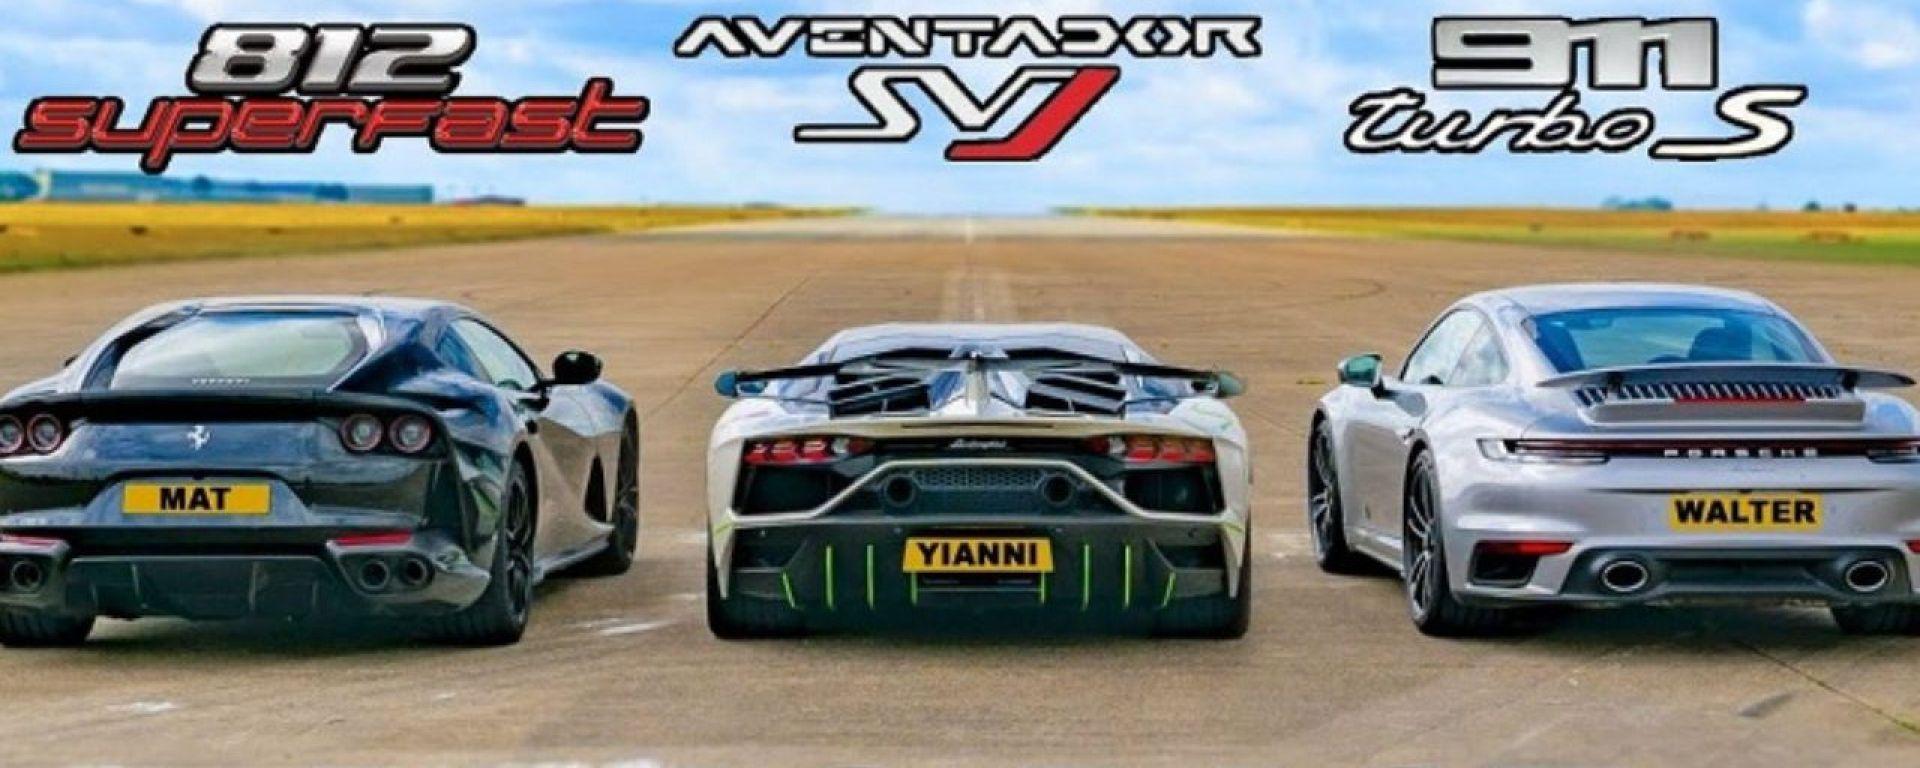 Dragrace a tre: Porsche 911 Turbo S vs Lamborghini Aventador SVJ vs Ferrari 812 Superfast